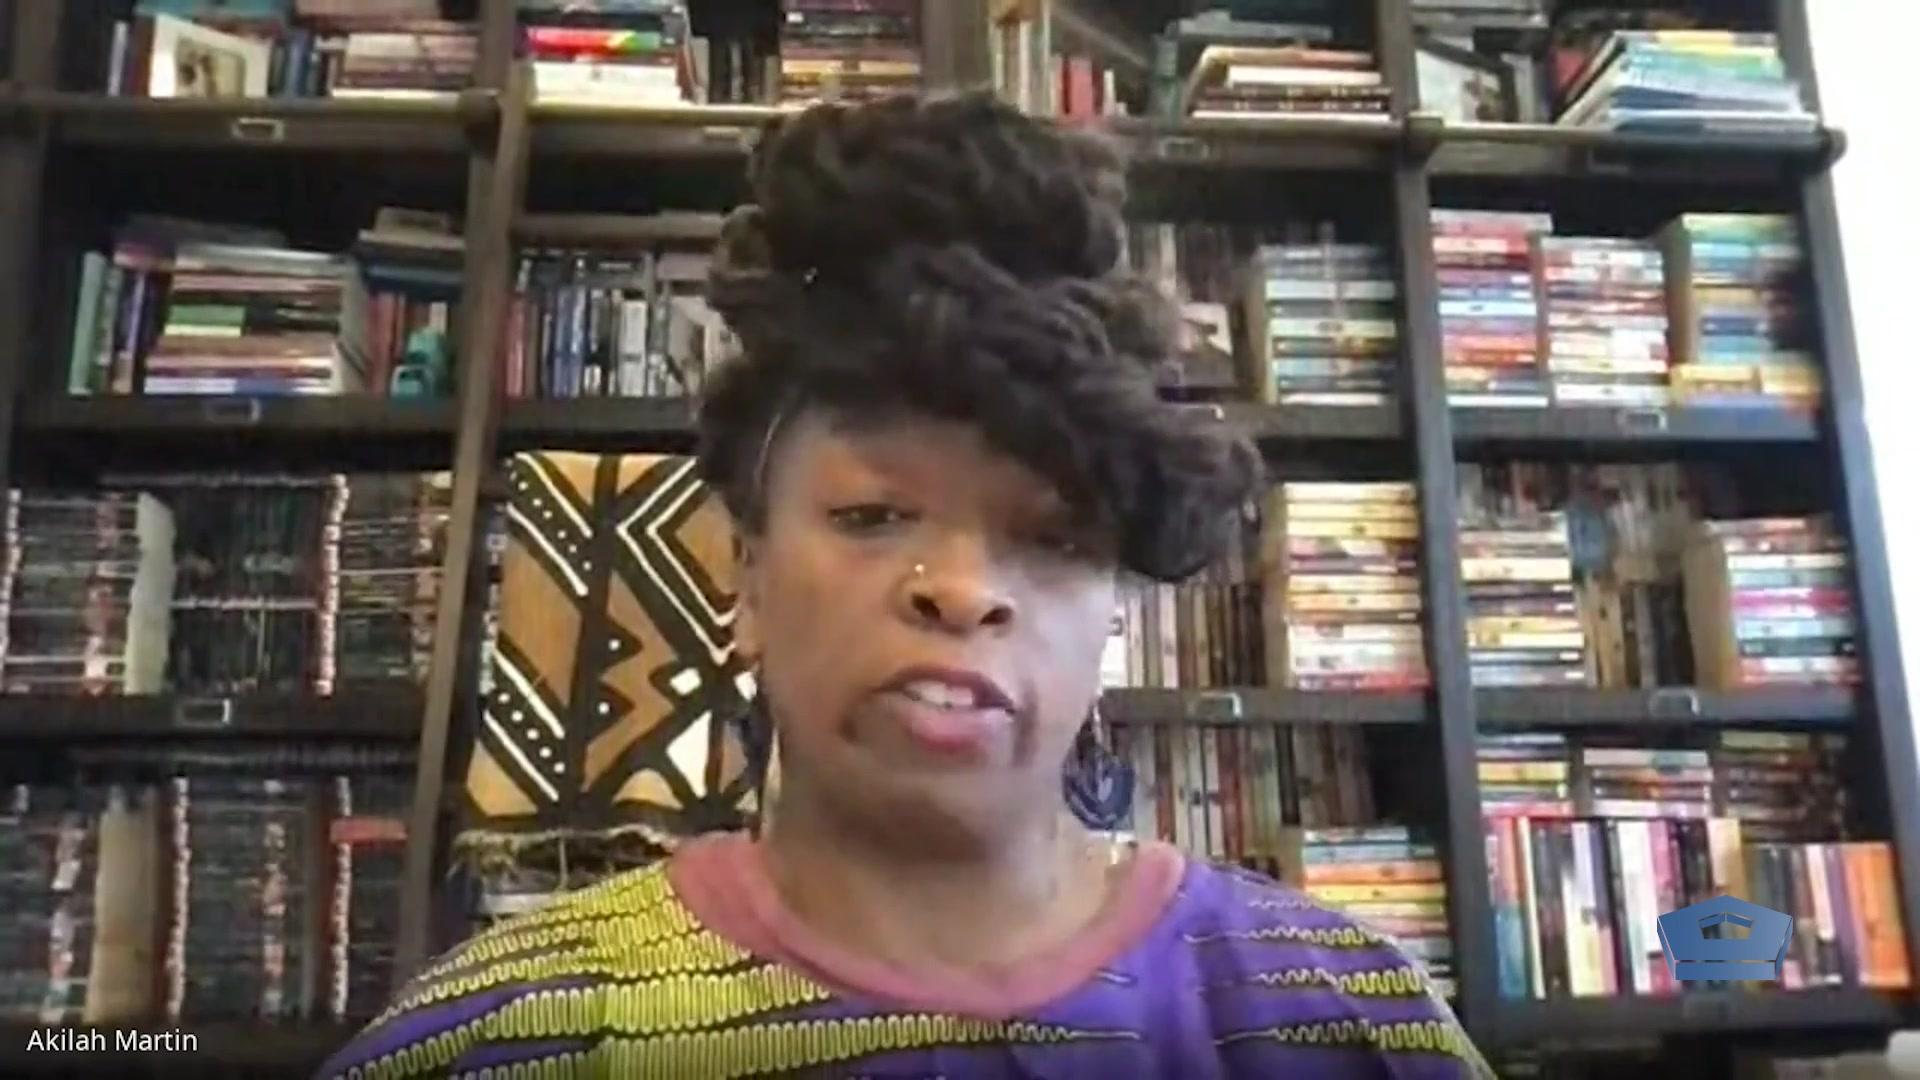 A civilian speaks in front of a bookshelf.